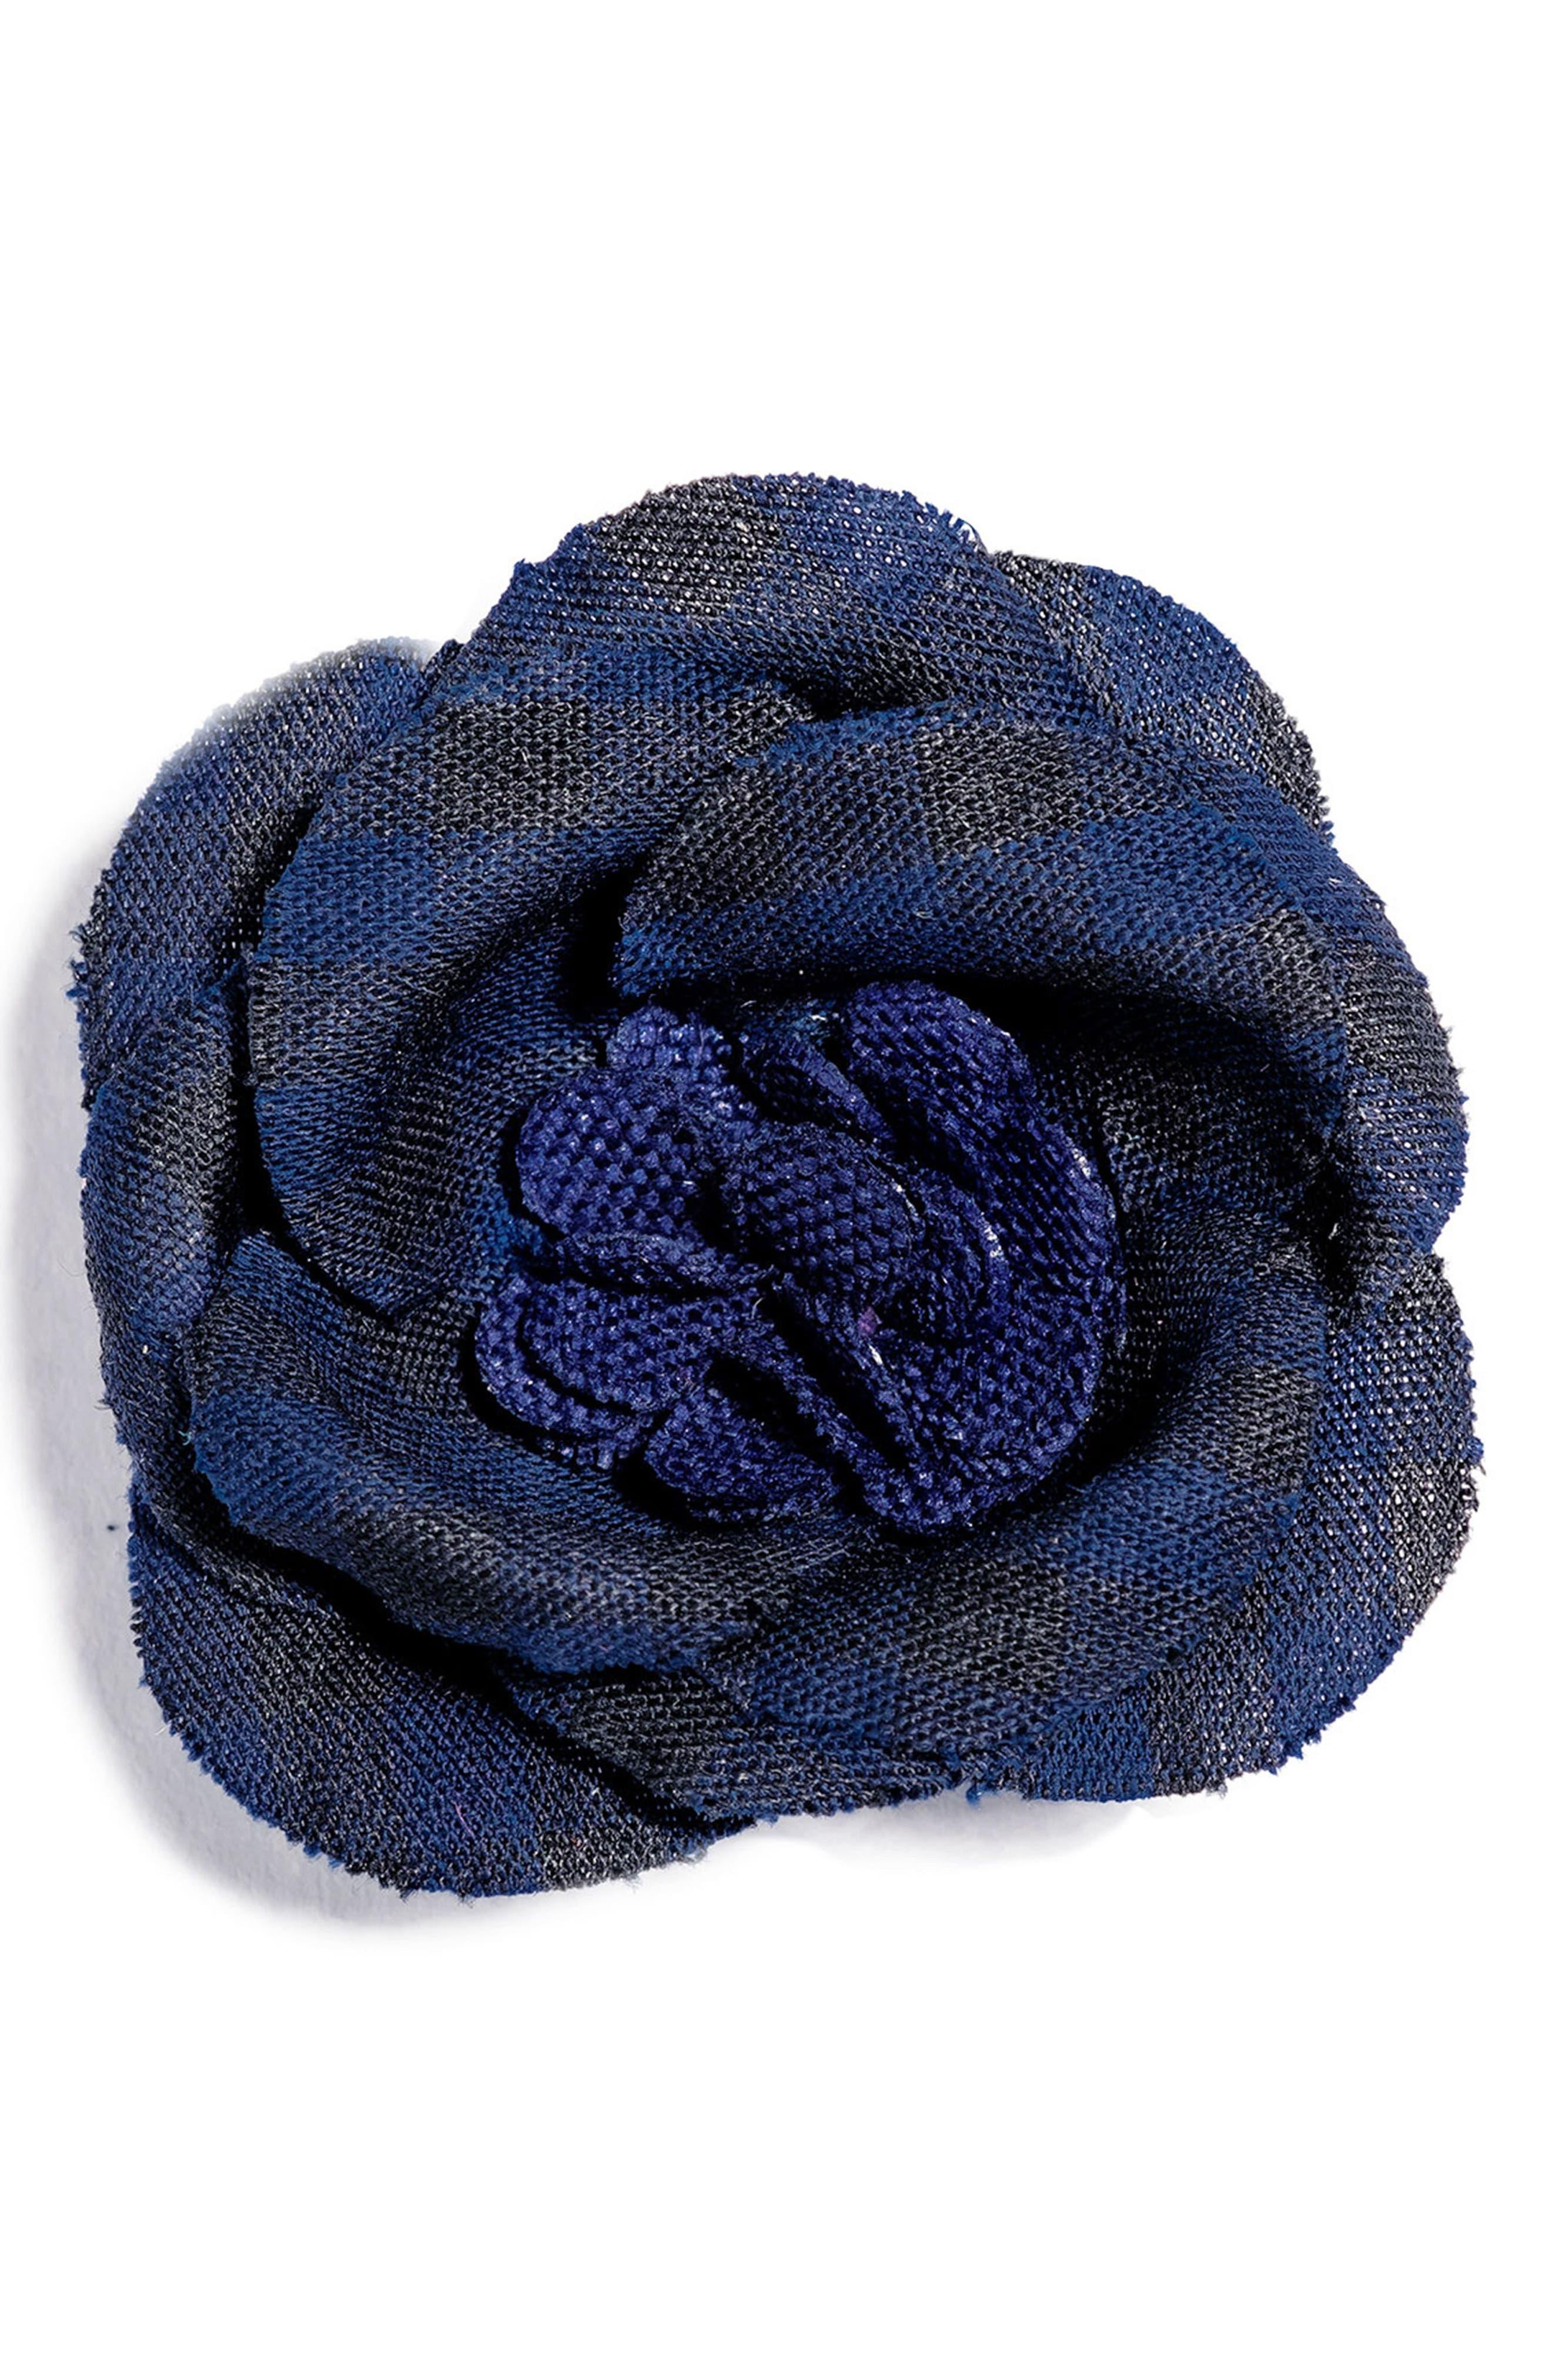 Poplin Check Lapel Flower,                         Main,                         color, Navy